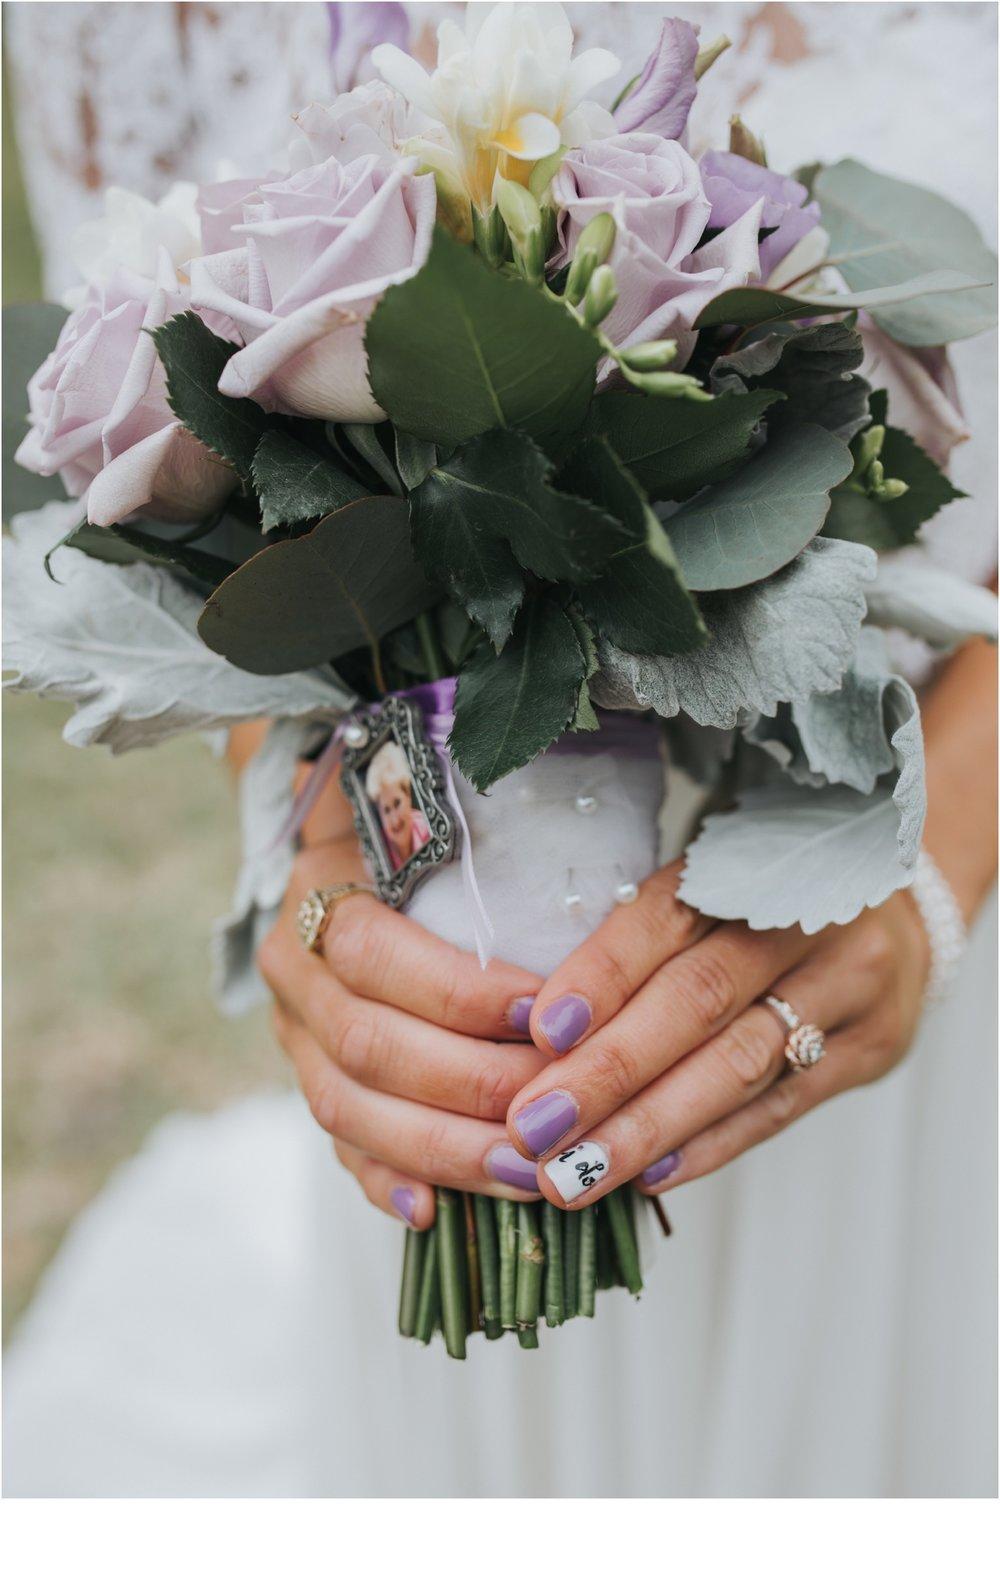 Rainey_Gregg_Photography_St._Simons_Island_Georgia_California_Wedding_Portrait_Photography_1522.jpg